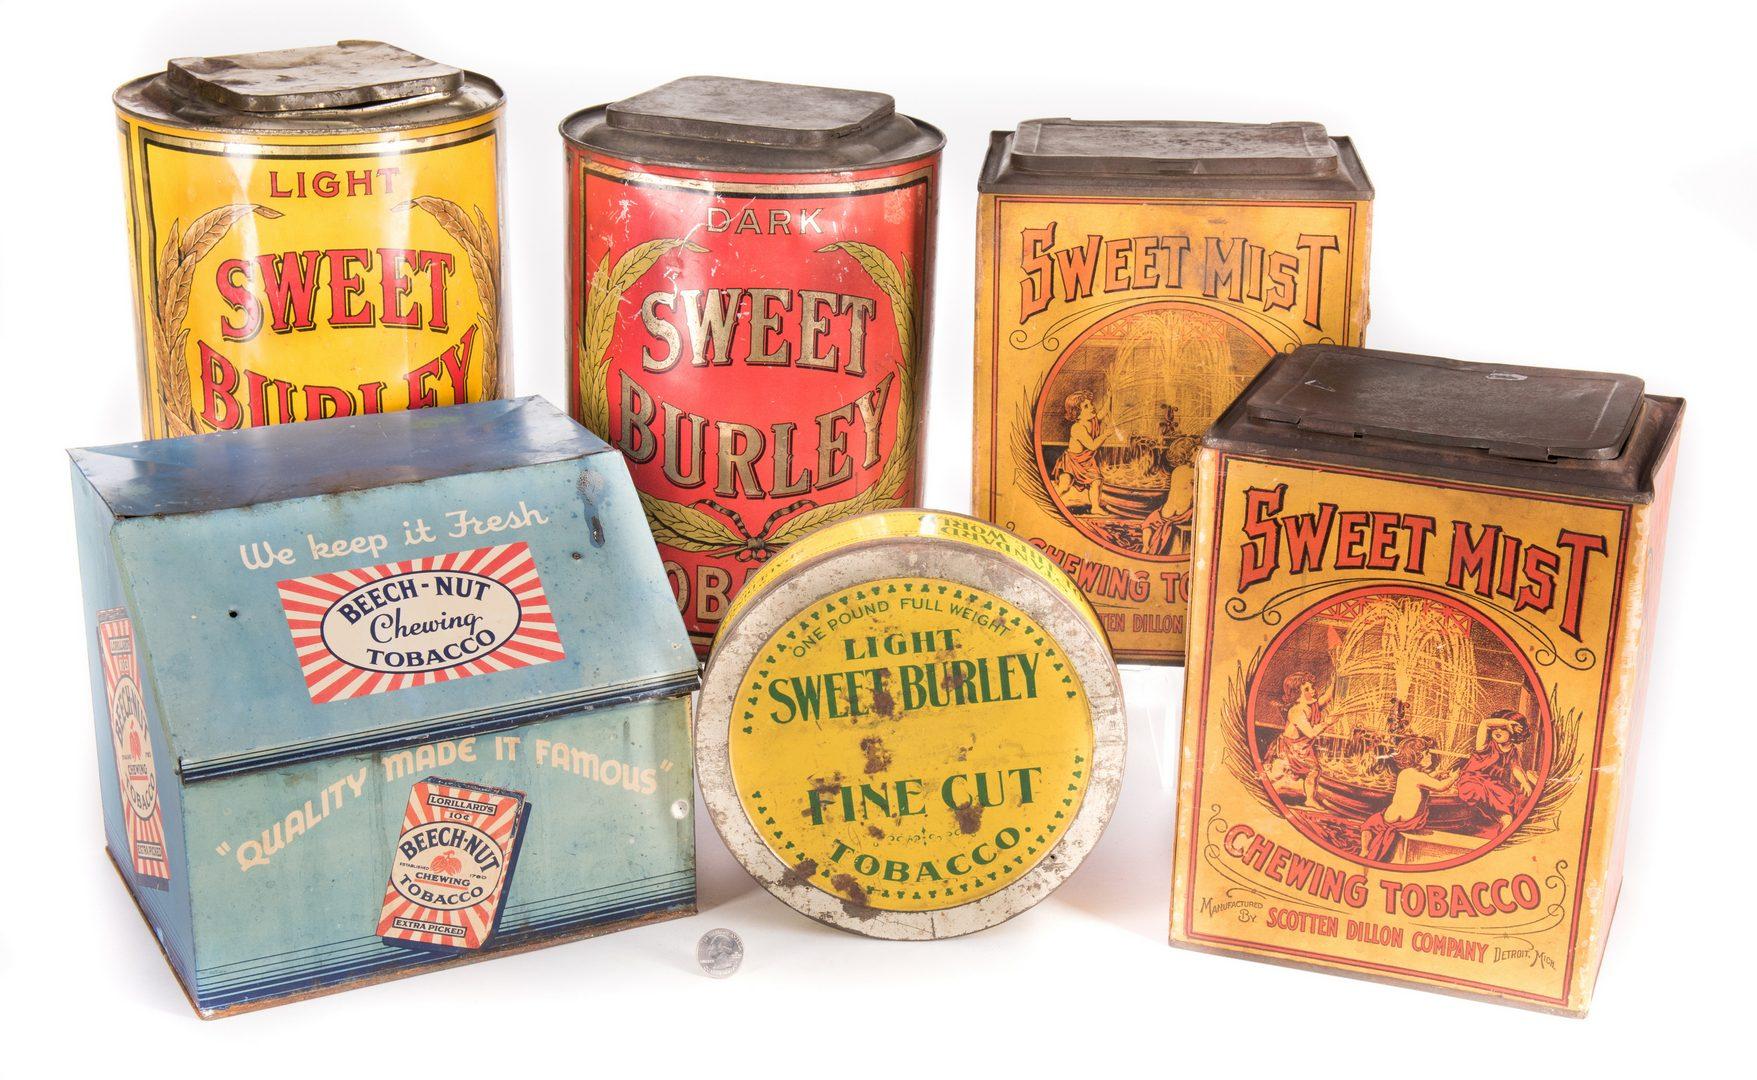 Lot 802: 6 Advertising Tobacco Tins, inc. Sweet Mist, Sweet Burley